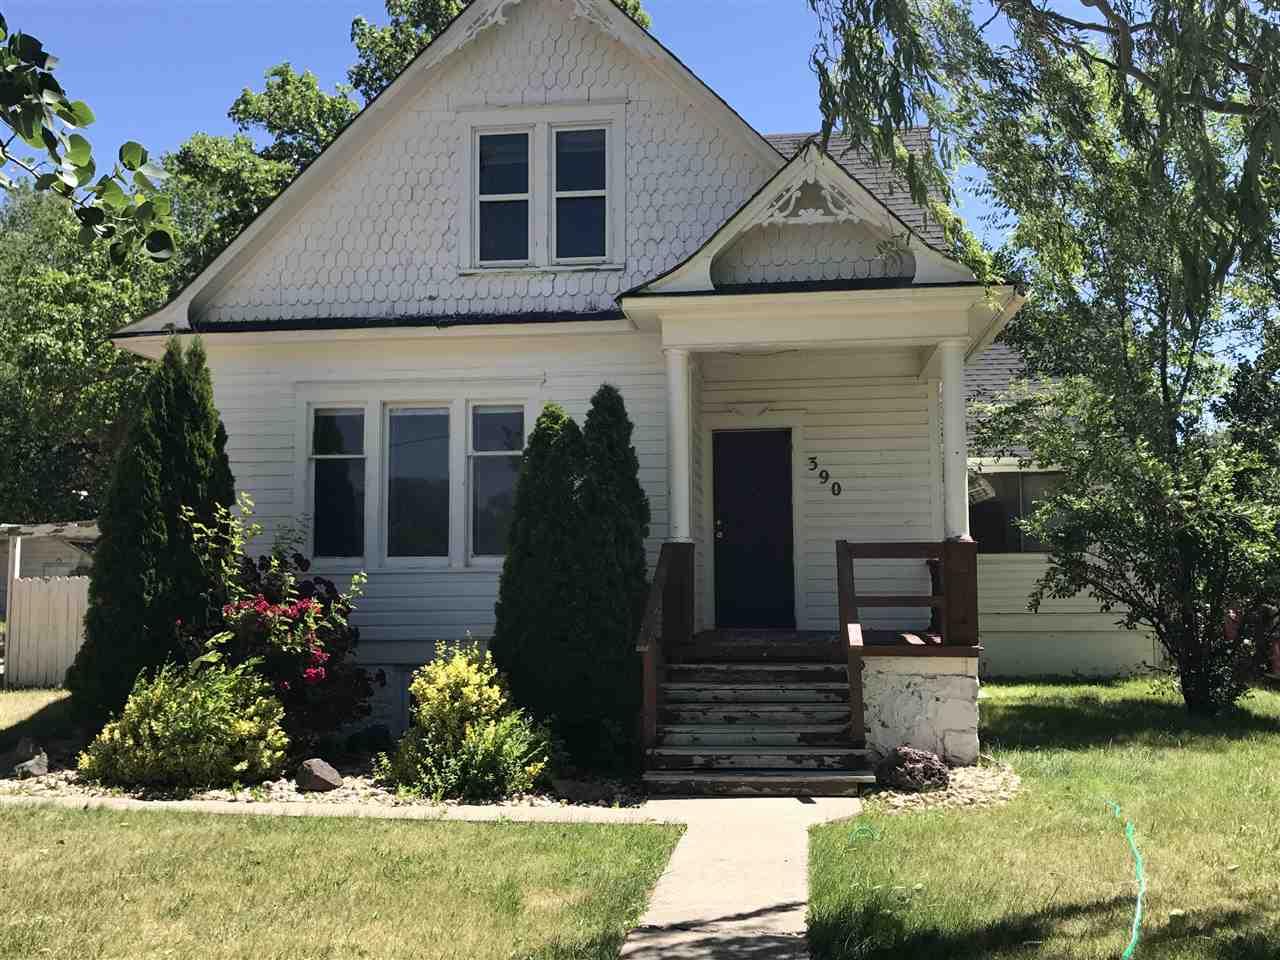 390 N 18th E., Mountain Home, ID 83647